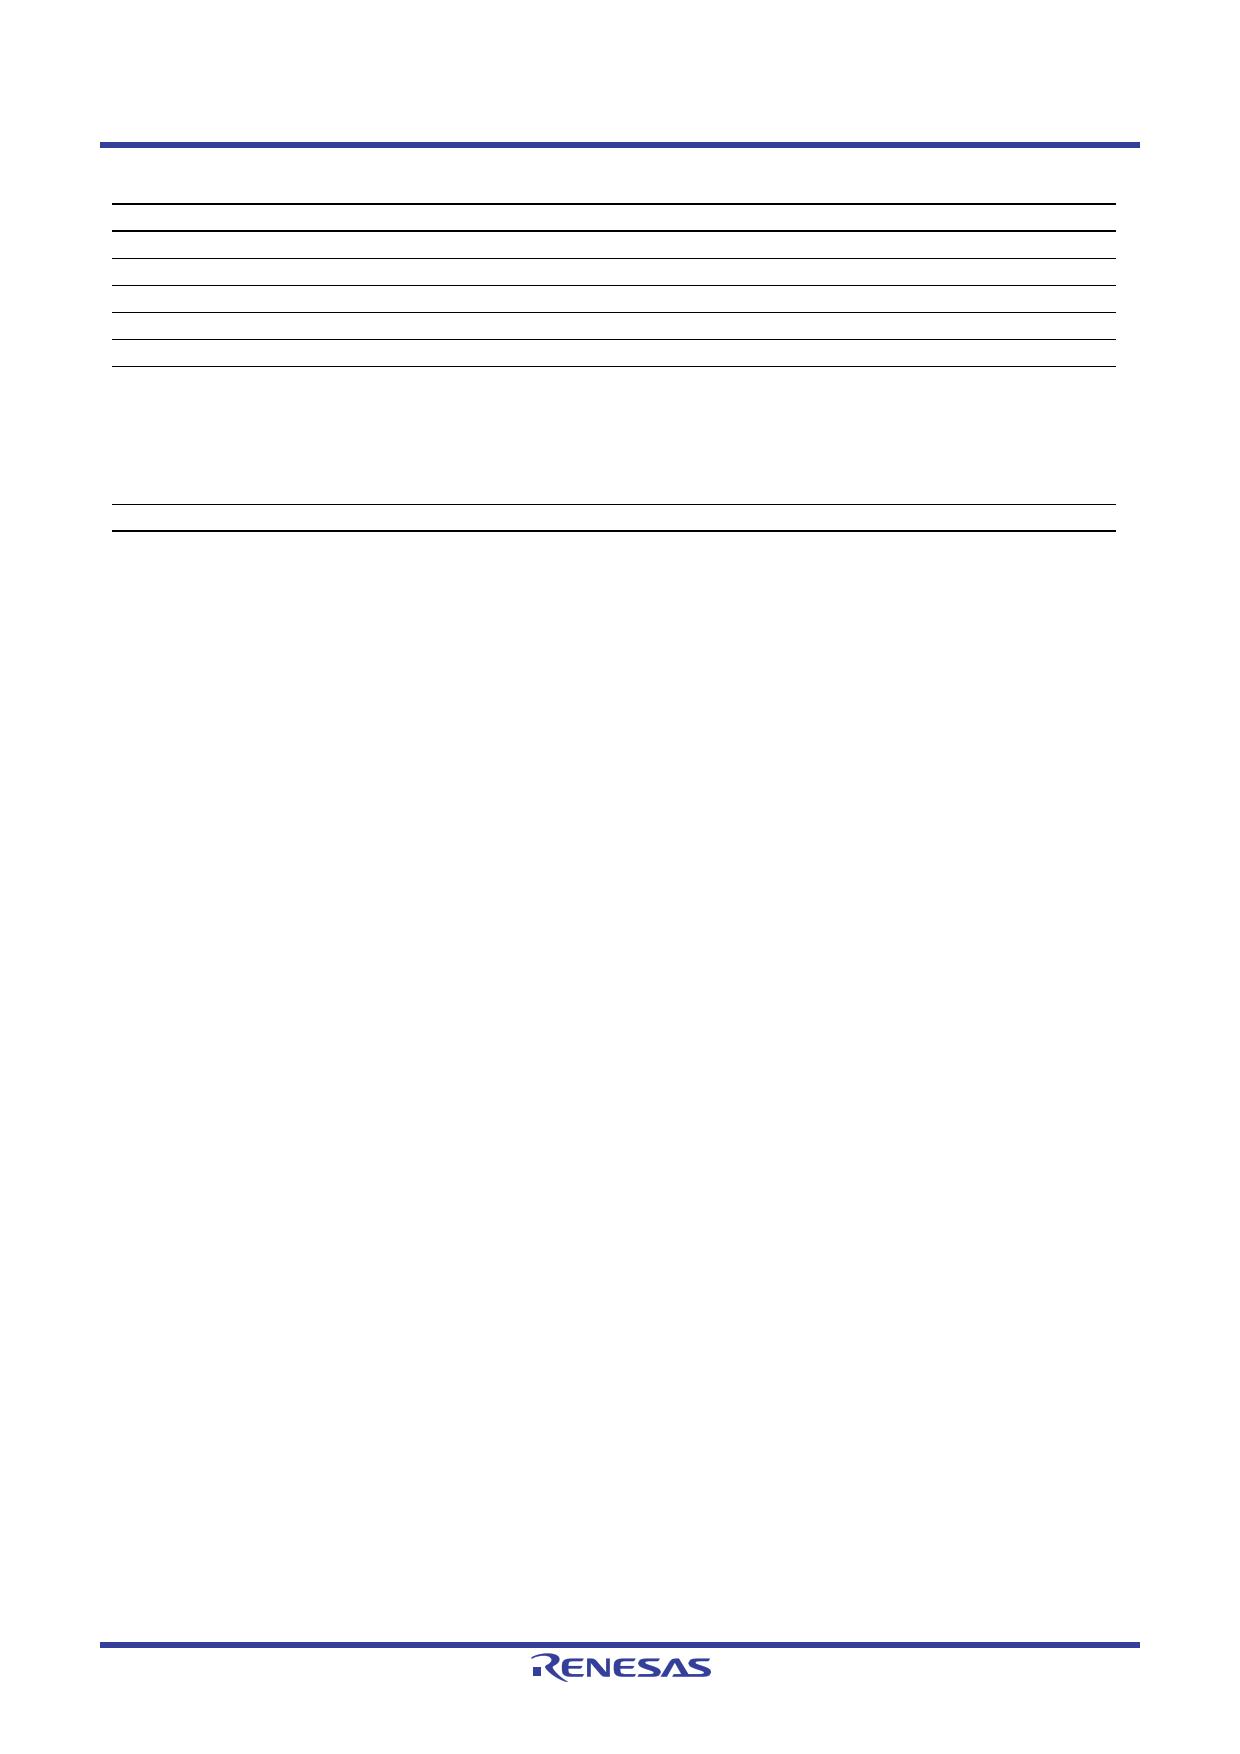 R5F51104ADFL pdf, 반도체, 판매, 대치품